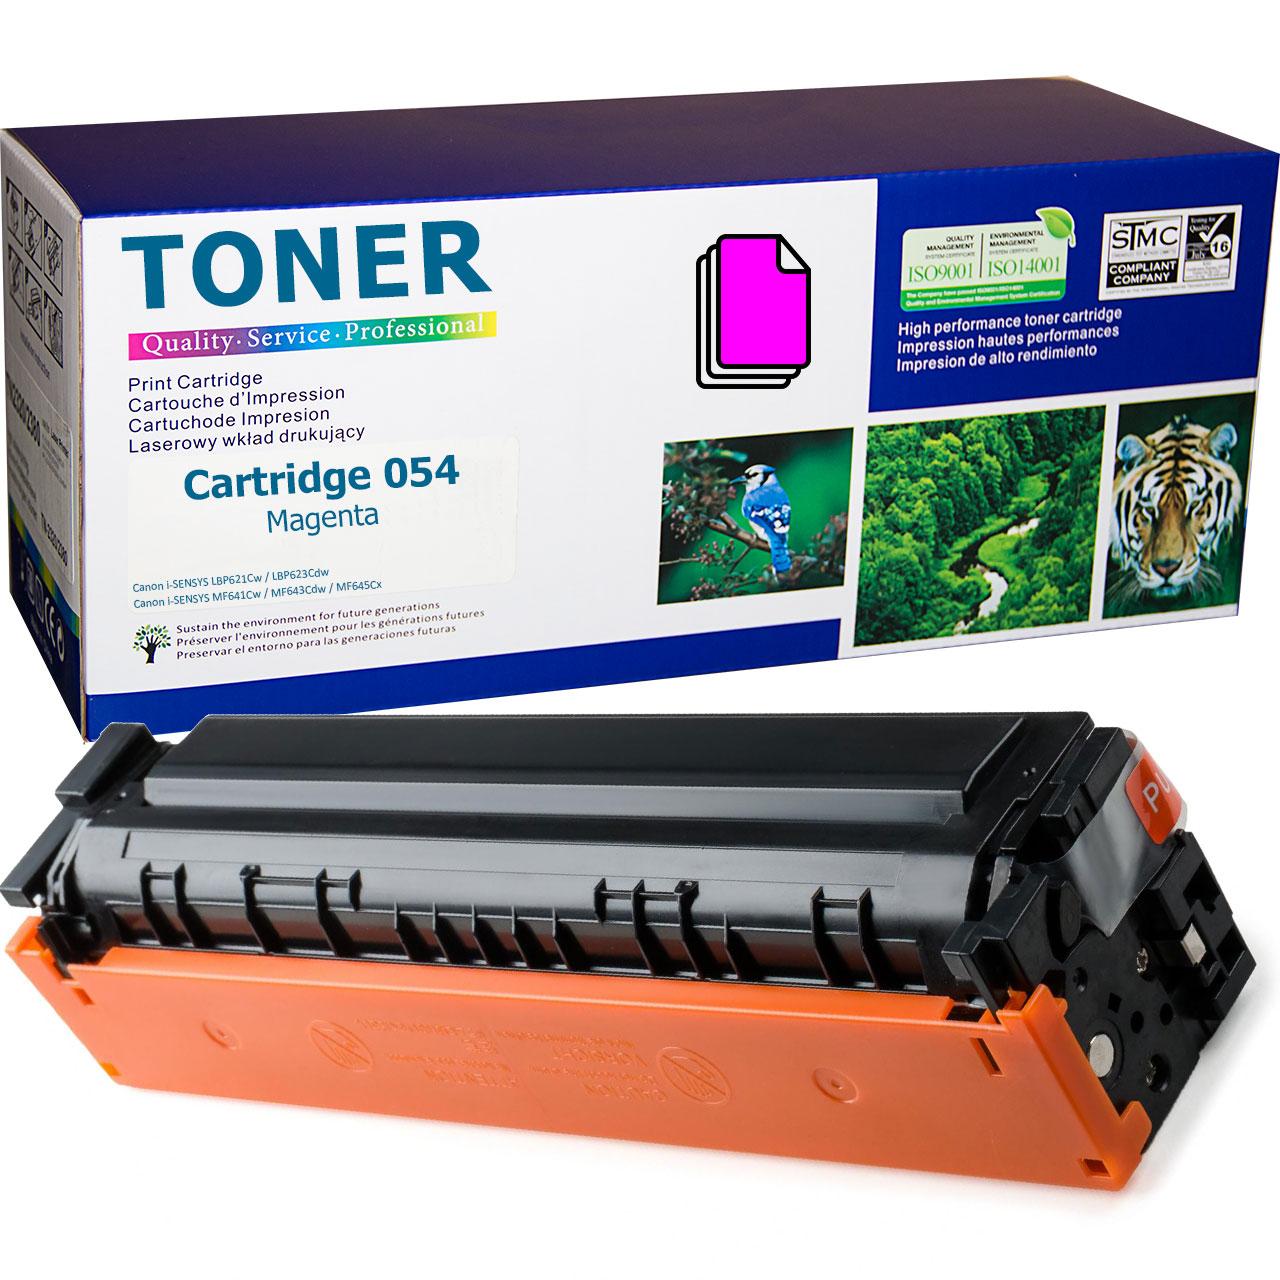 Canon Cartridge 054 Magenta Toner Cartridge